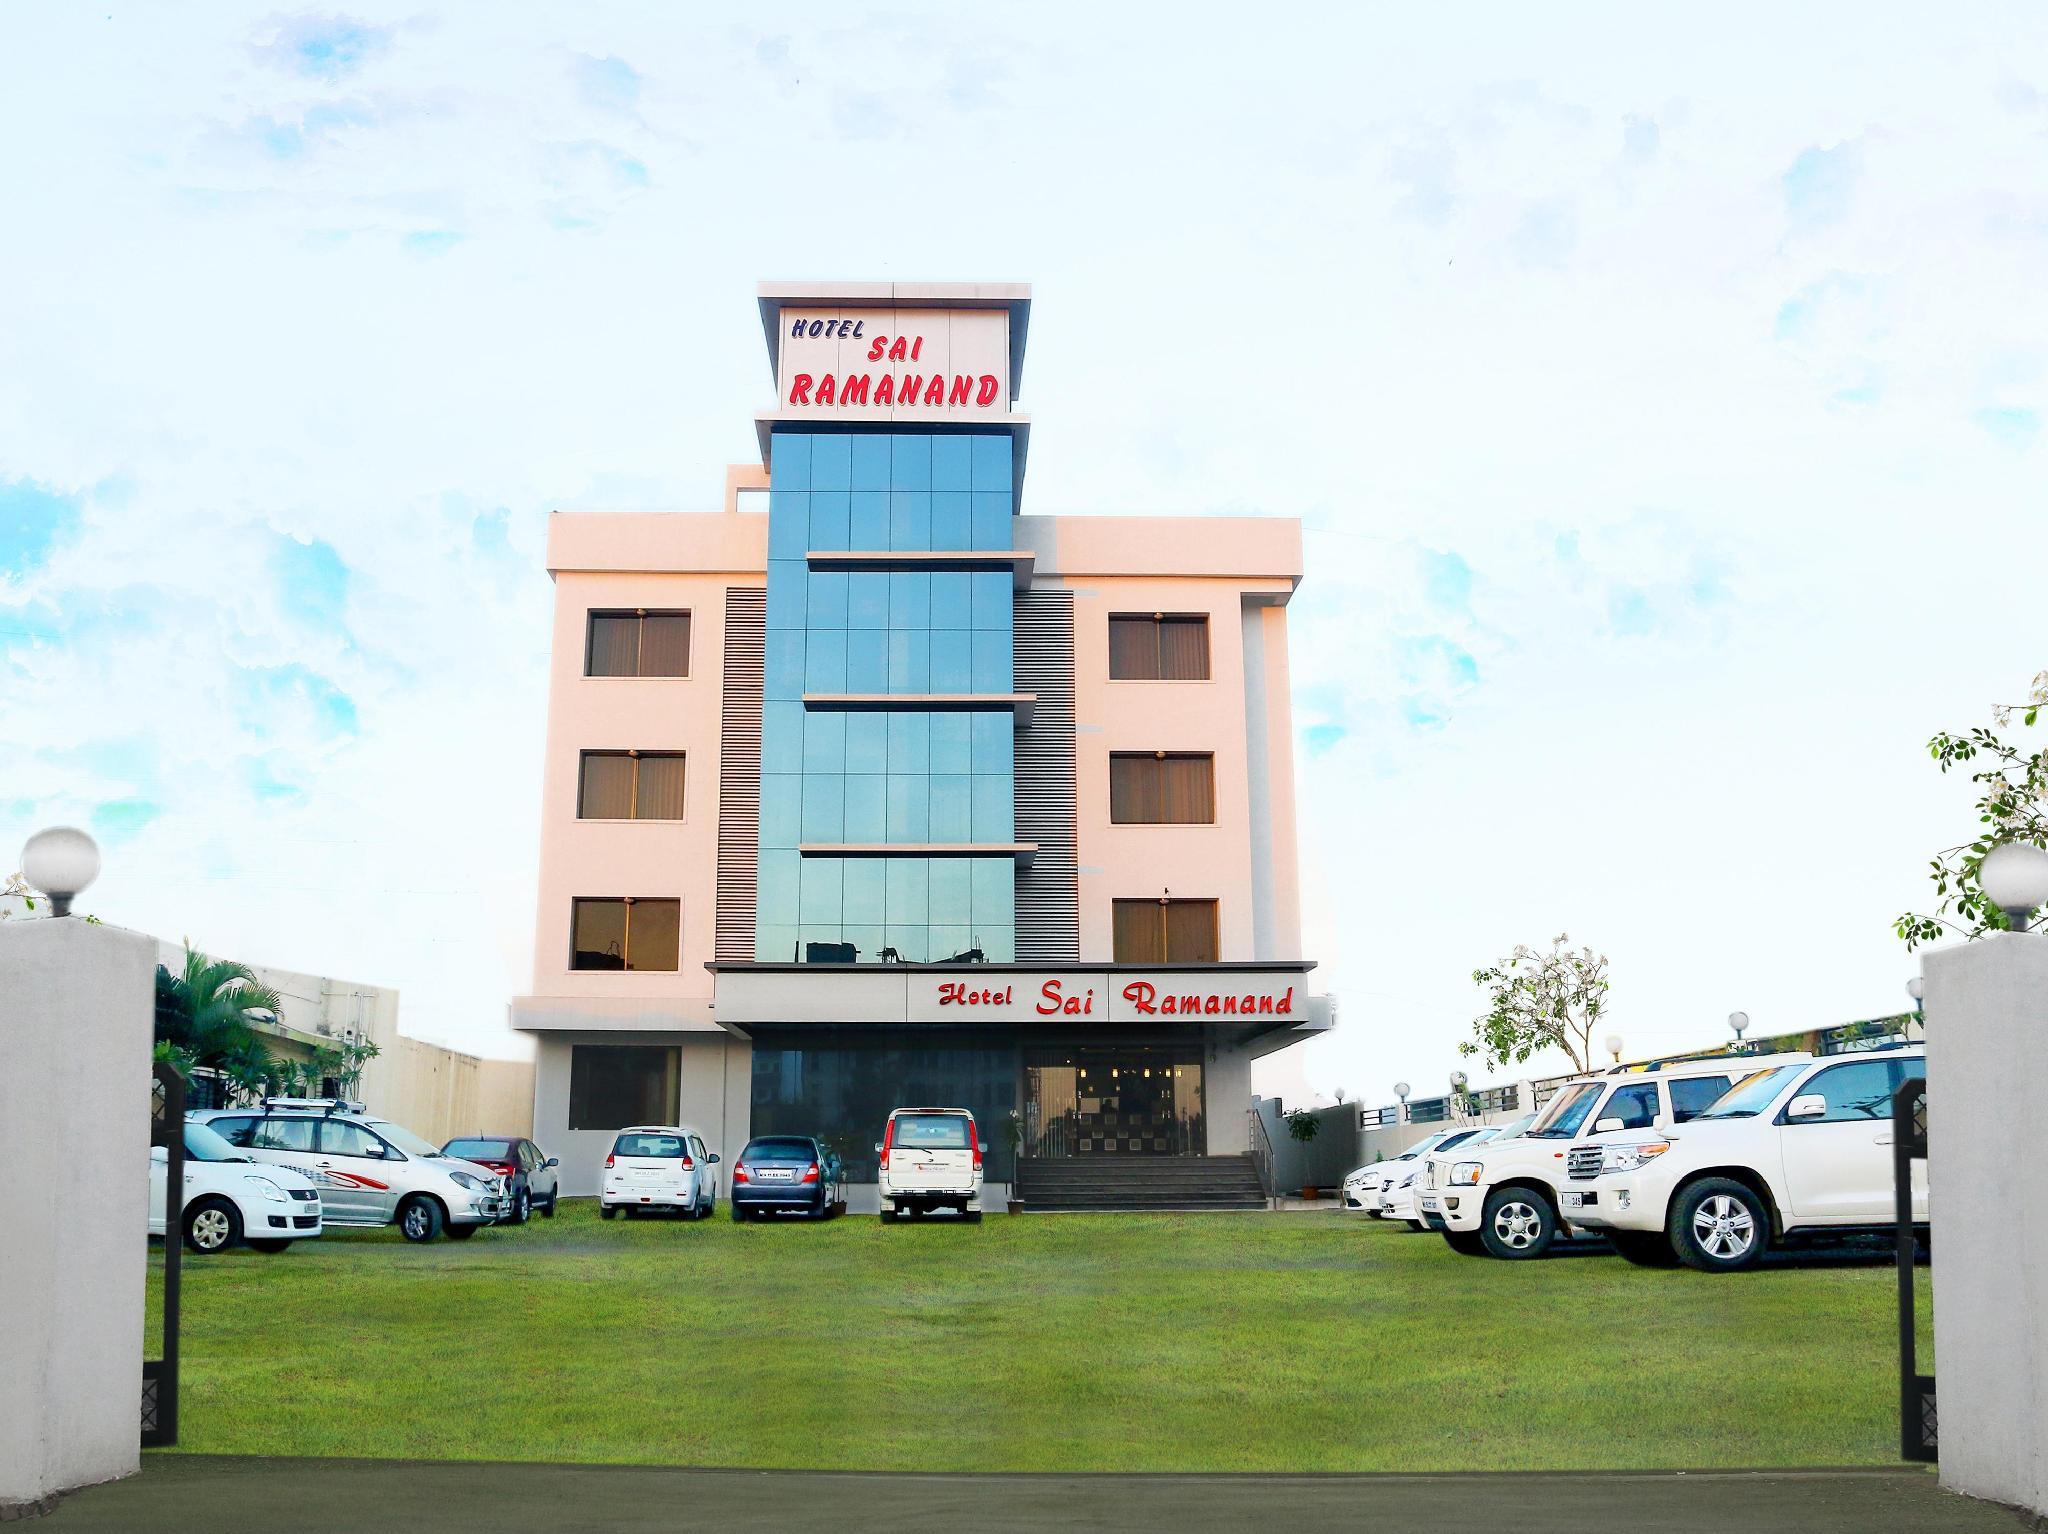 Hotel Sai Balaji Hotels In Shirdi India Book Hotels And Cheap Accommodation